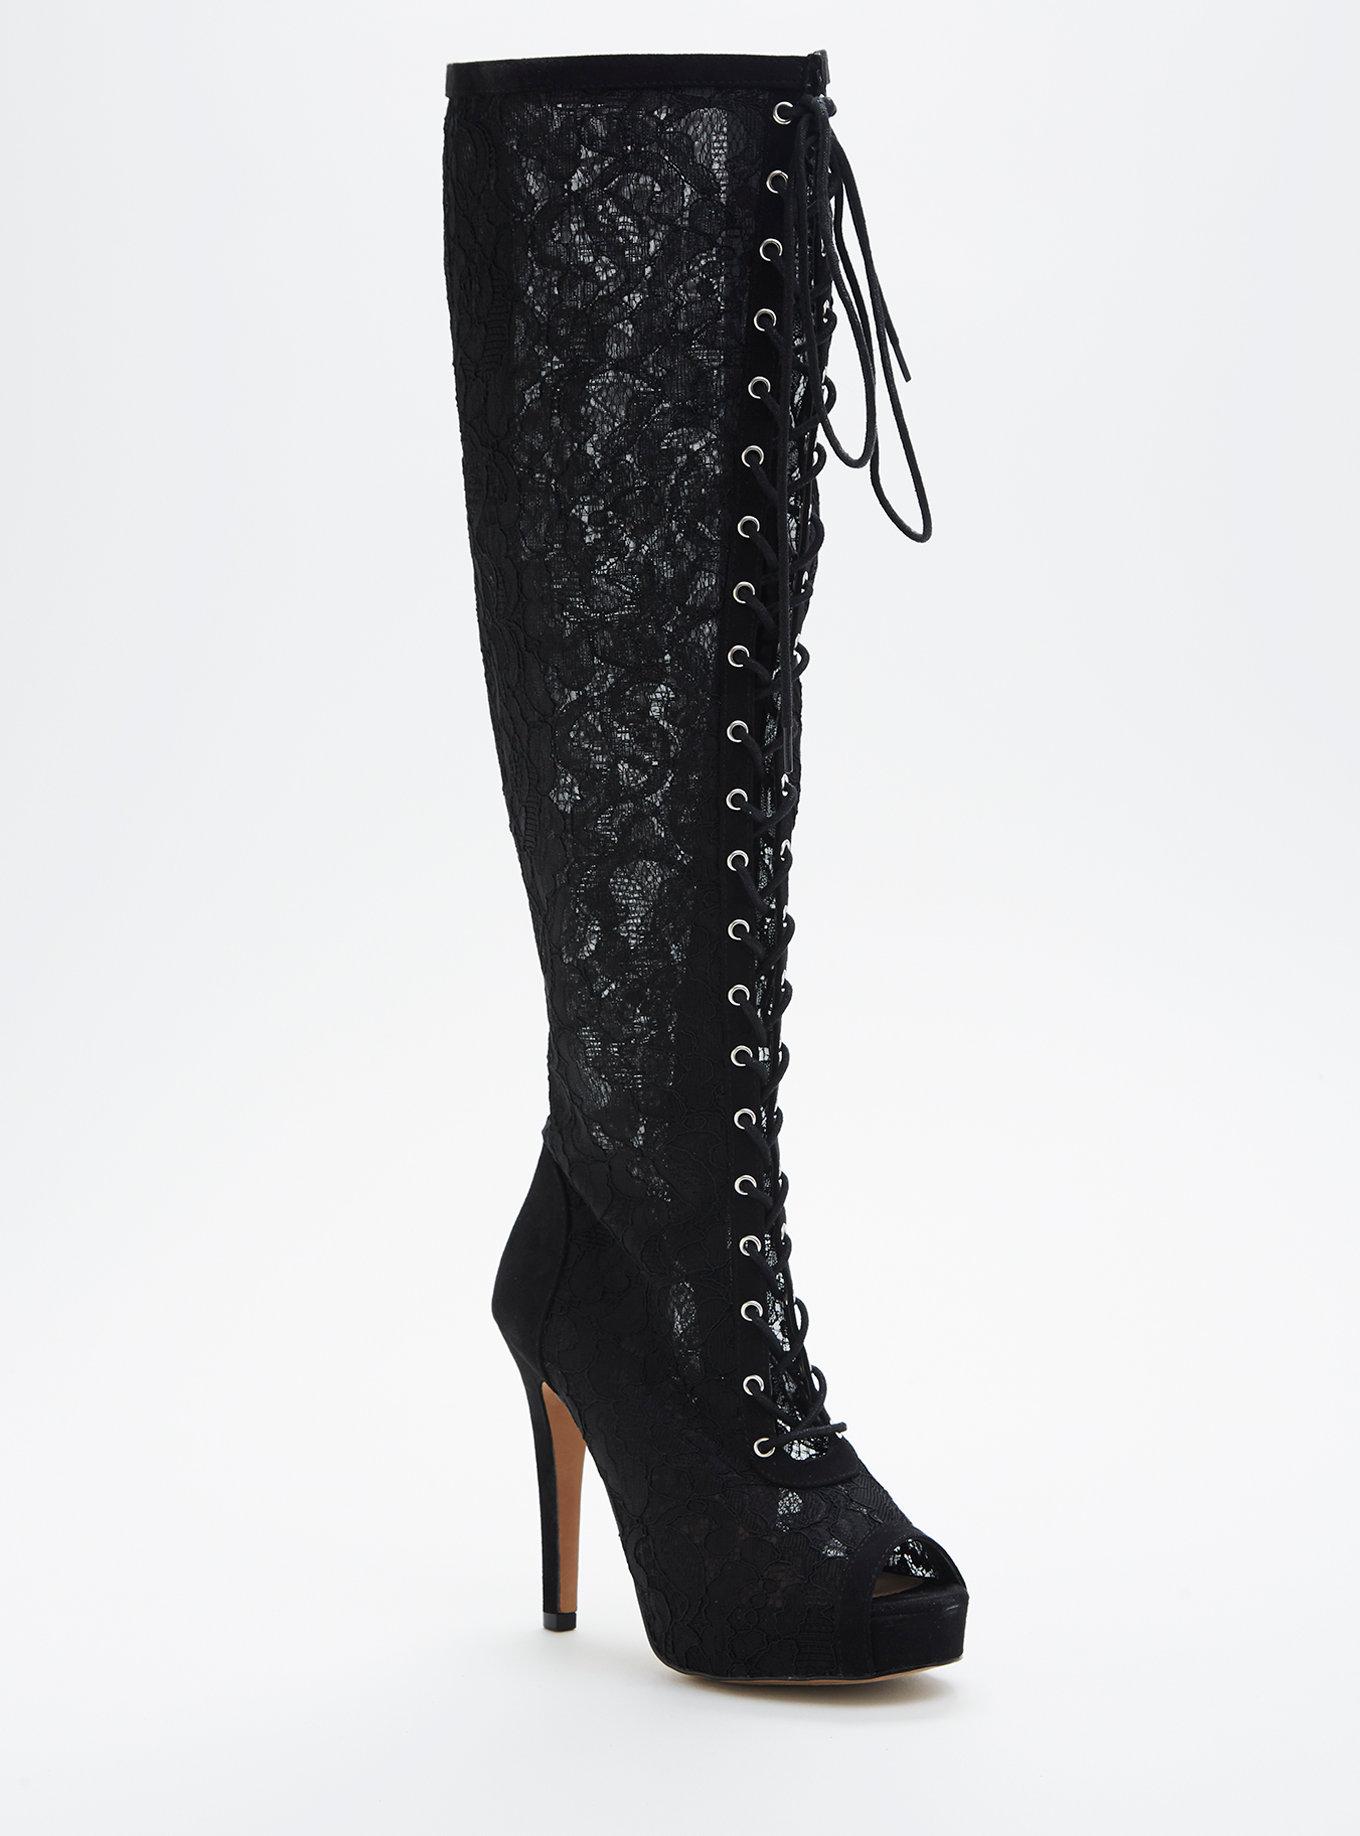 d2774059c51 Ashley Stewart Velvet Boots · Torrid Ruffled Boot · Gray Over the knee wide  calf boots